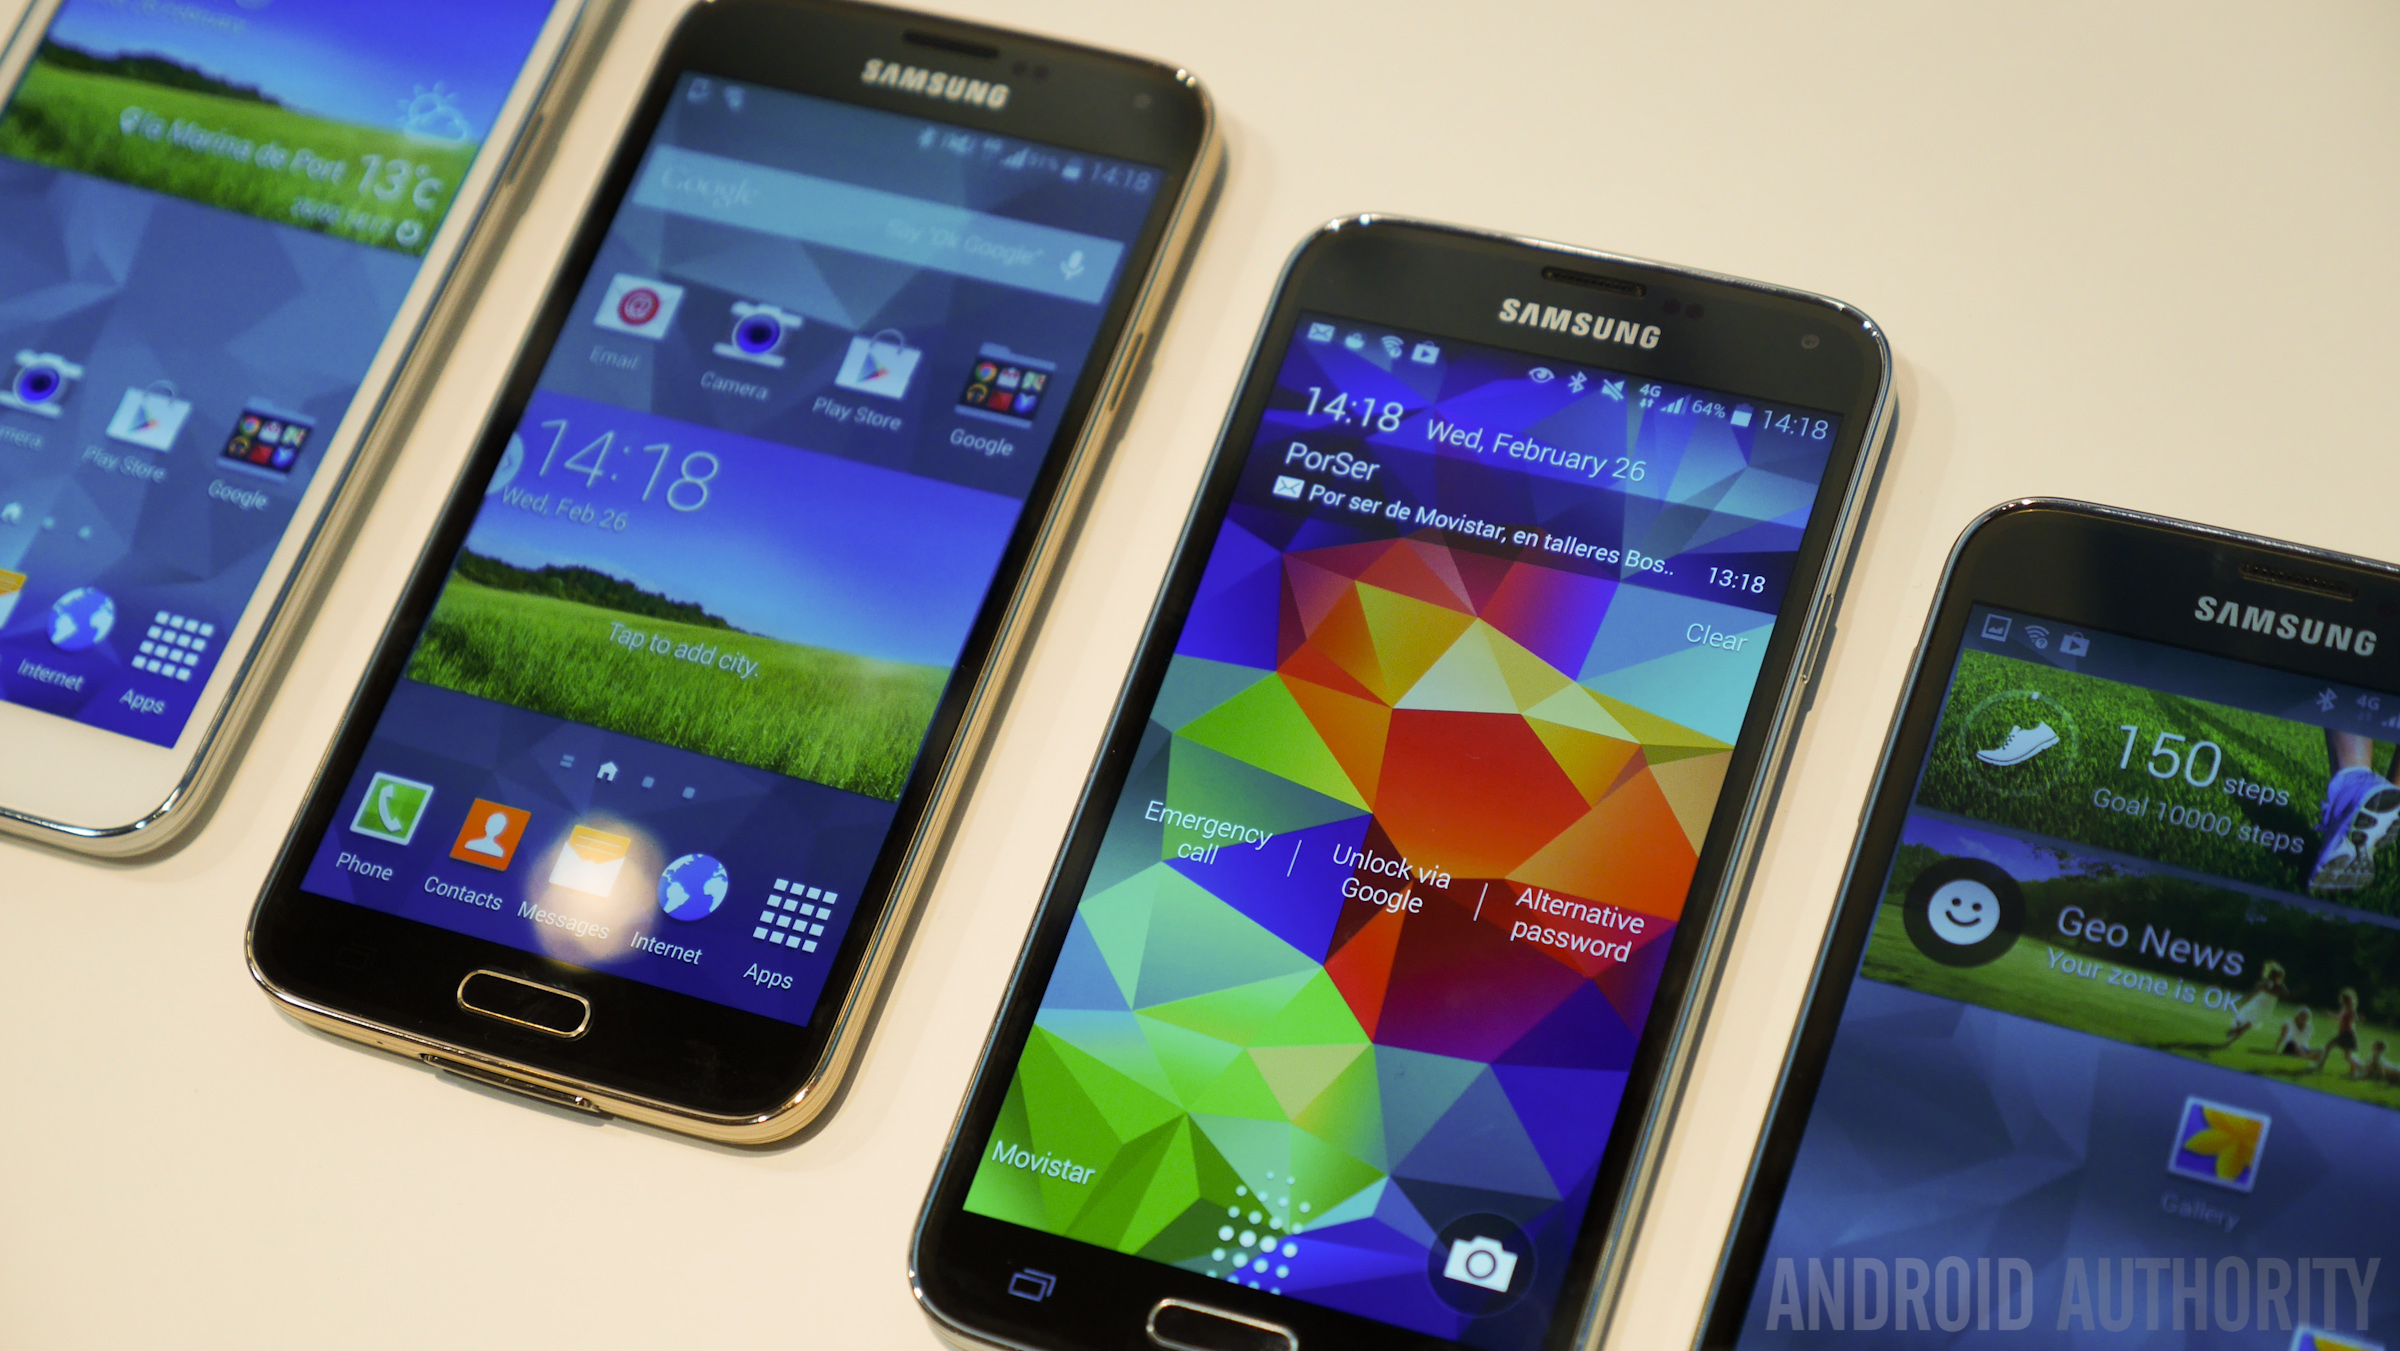 Mwc Samsung Galaxy S5 Live Wallpaper - Samsung Galaxy - HD Wallpaper